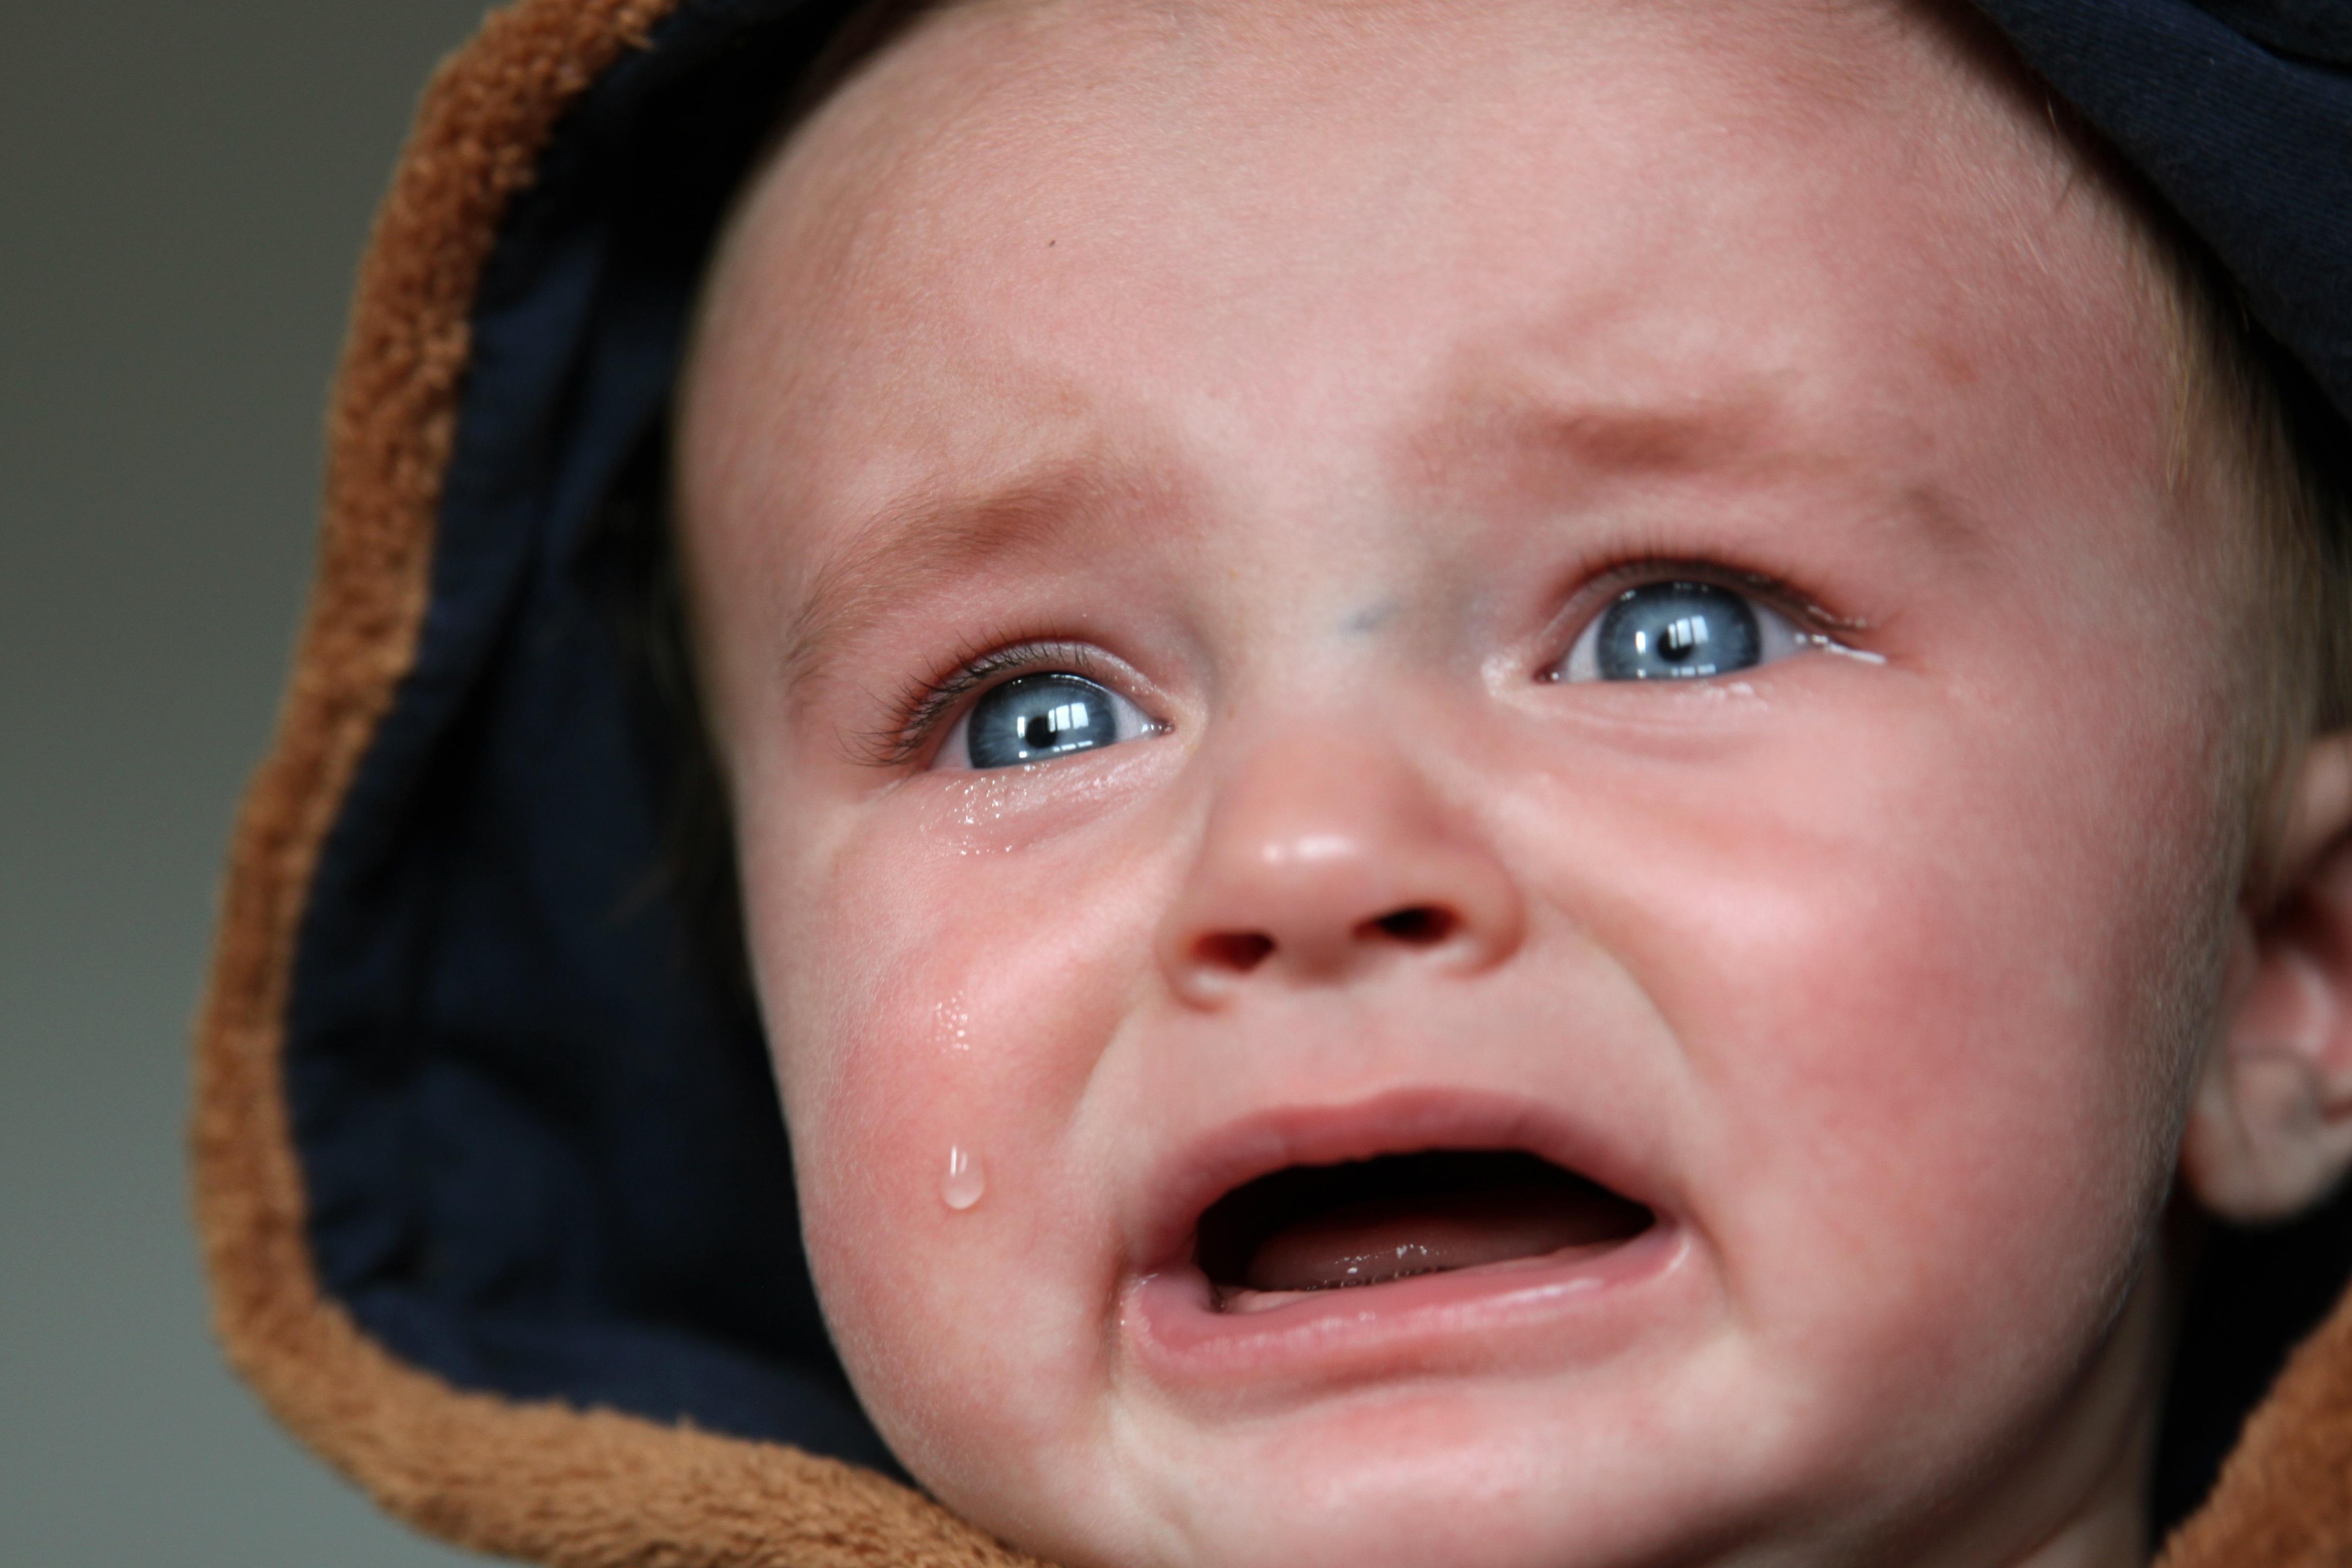 baby-tears-small-child-sad-47090